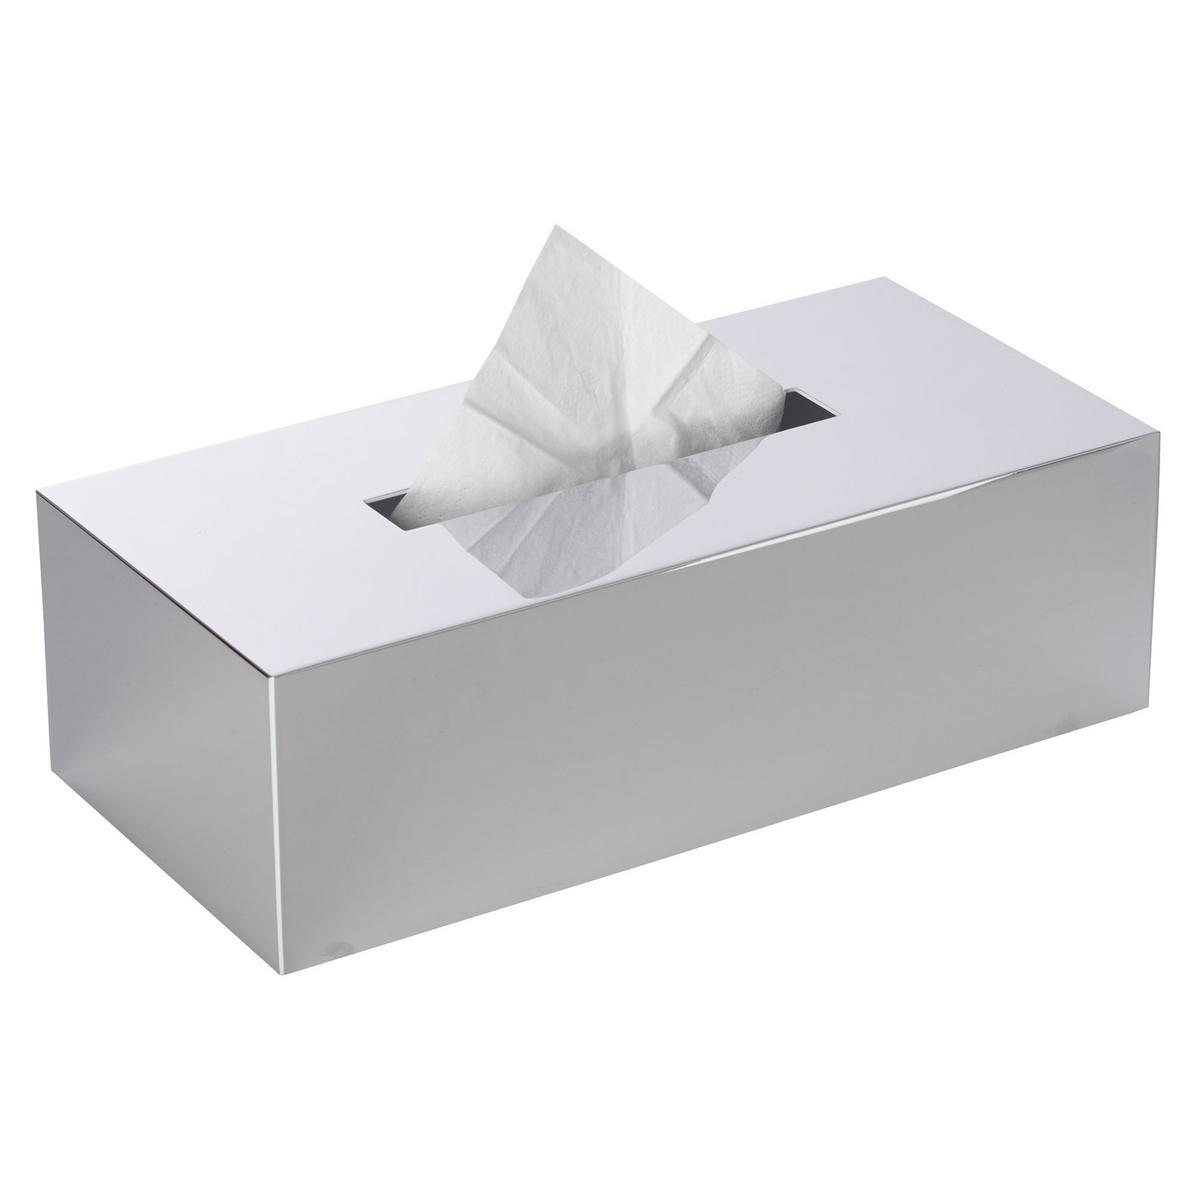 decor walther derby tissue box. Black Bedroom Furniture Sets. Home Design Ideas